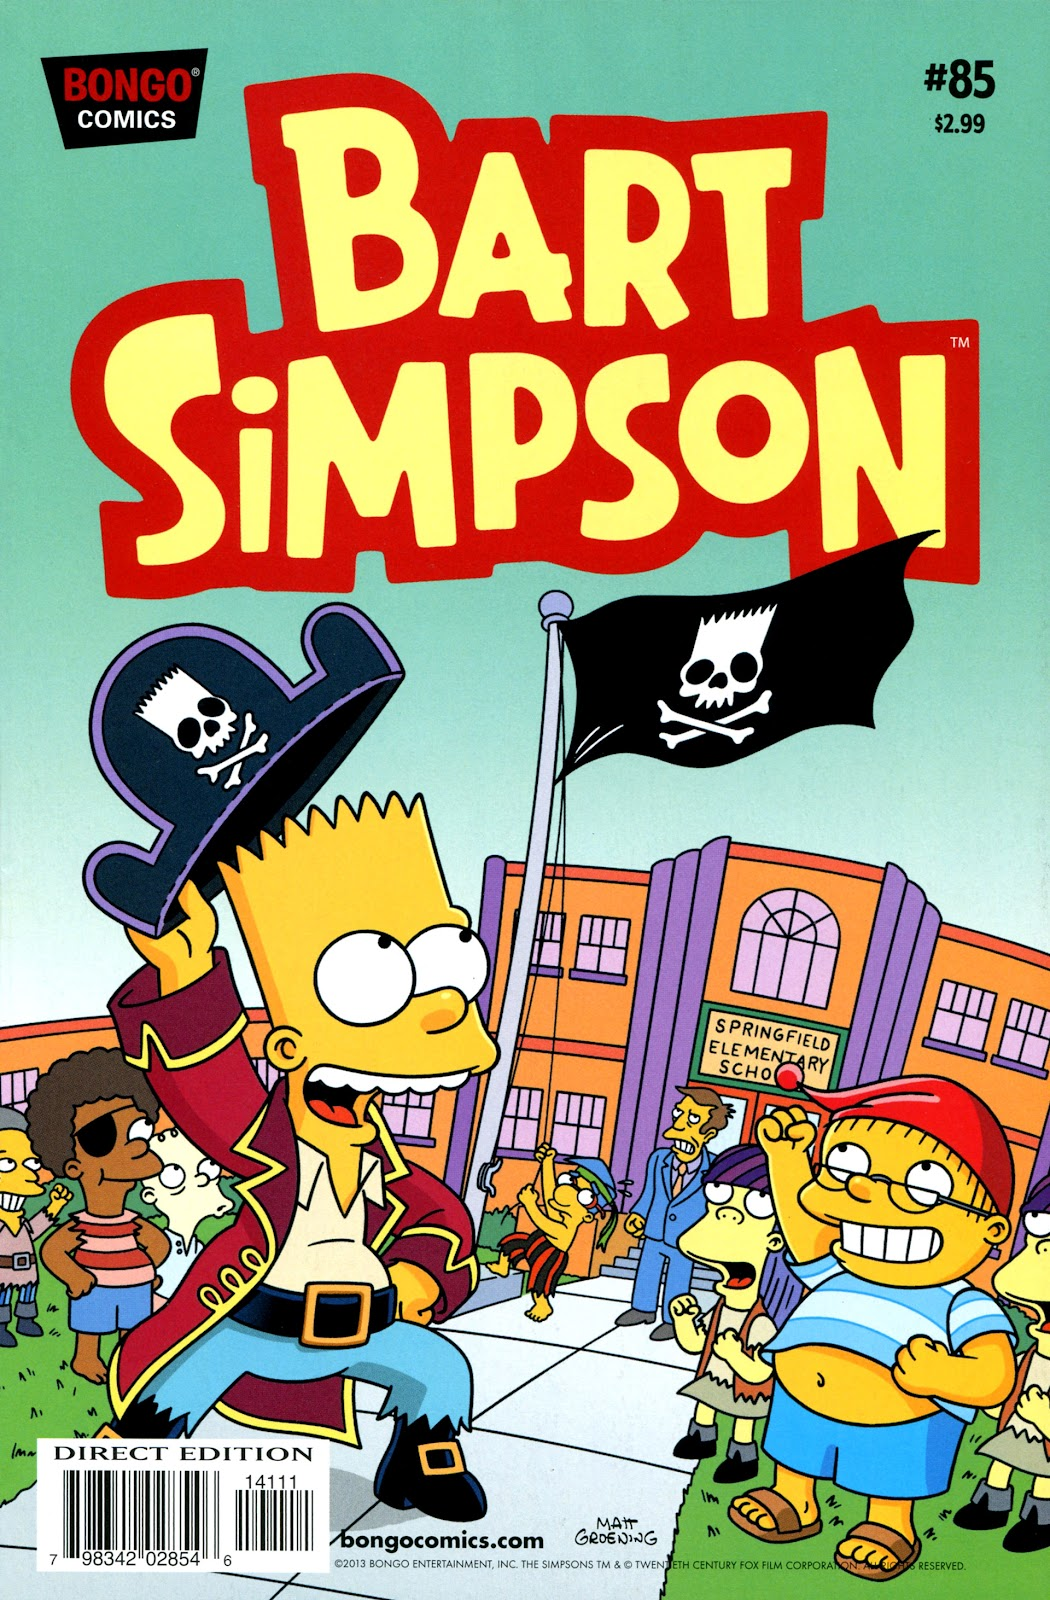 Simpsons Comics Presents Bart Simpson 85 Page 1